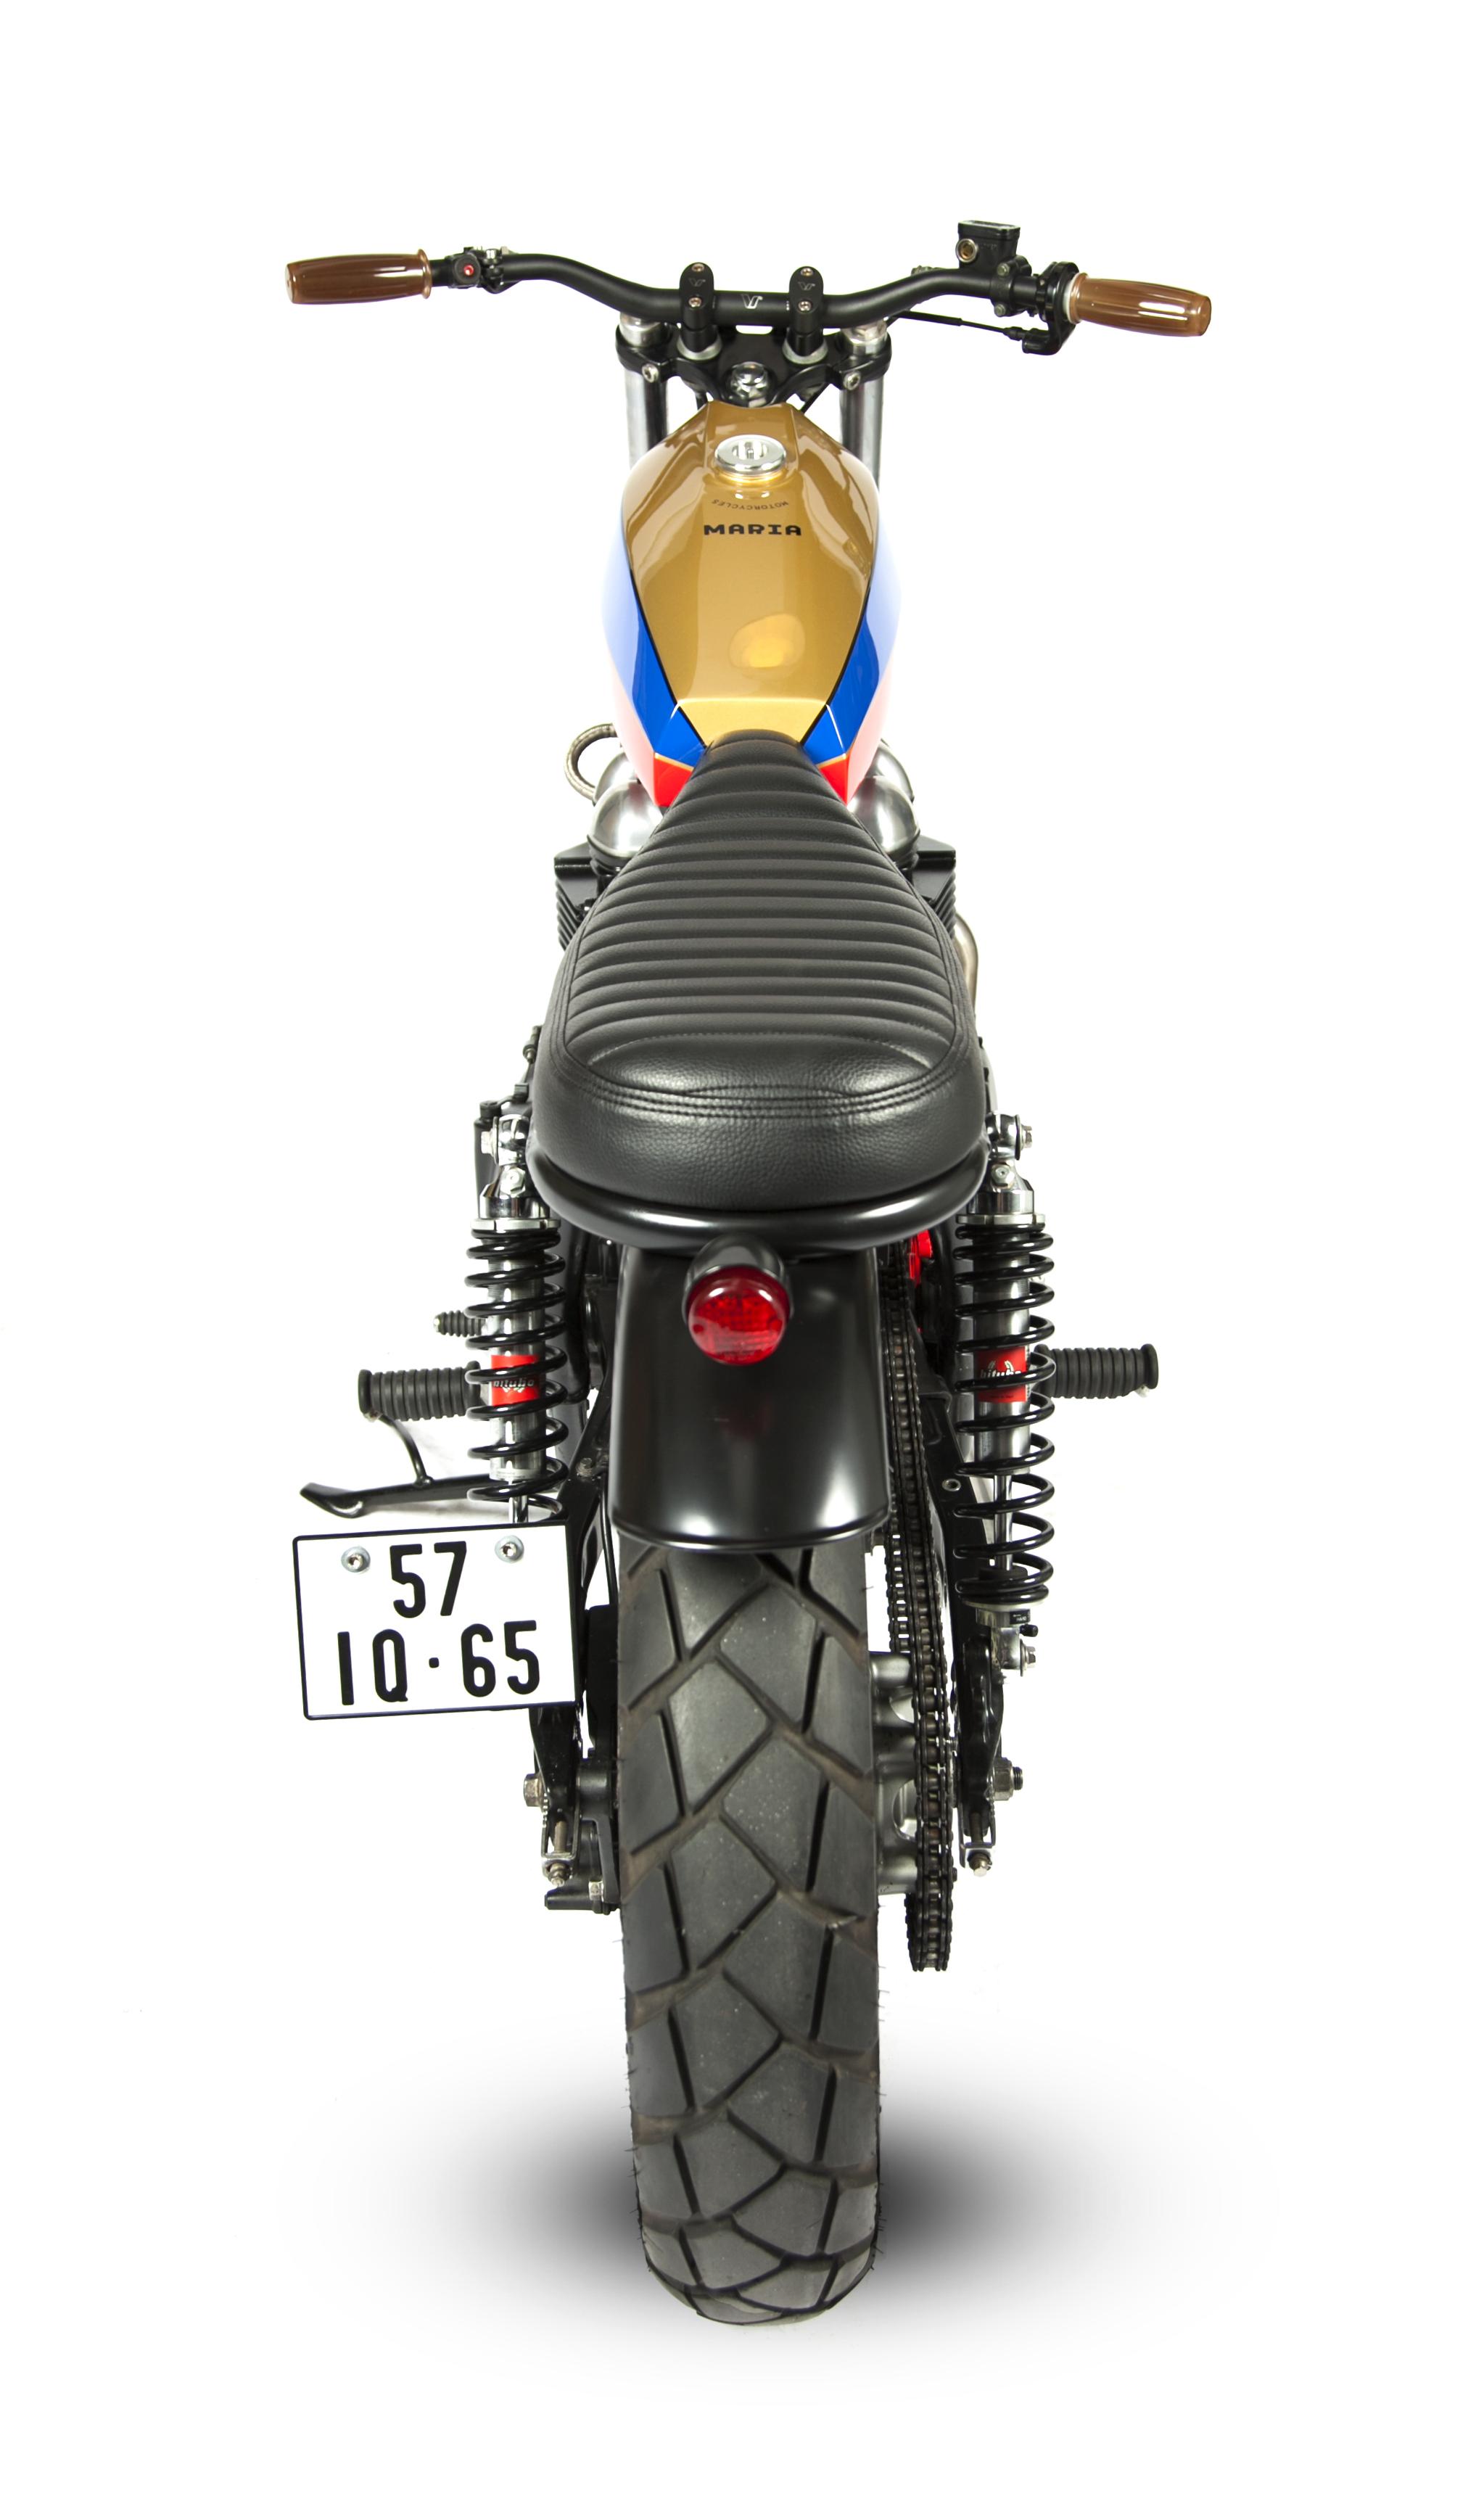 maria_motorcycles_triumph_bonneville_sillykid_0687